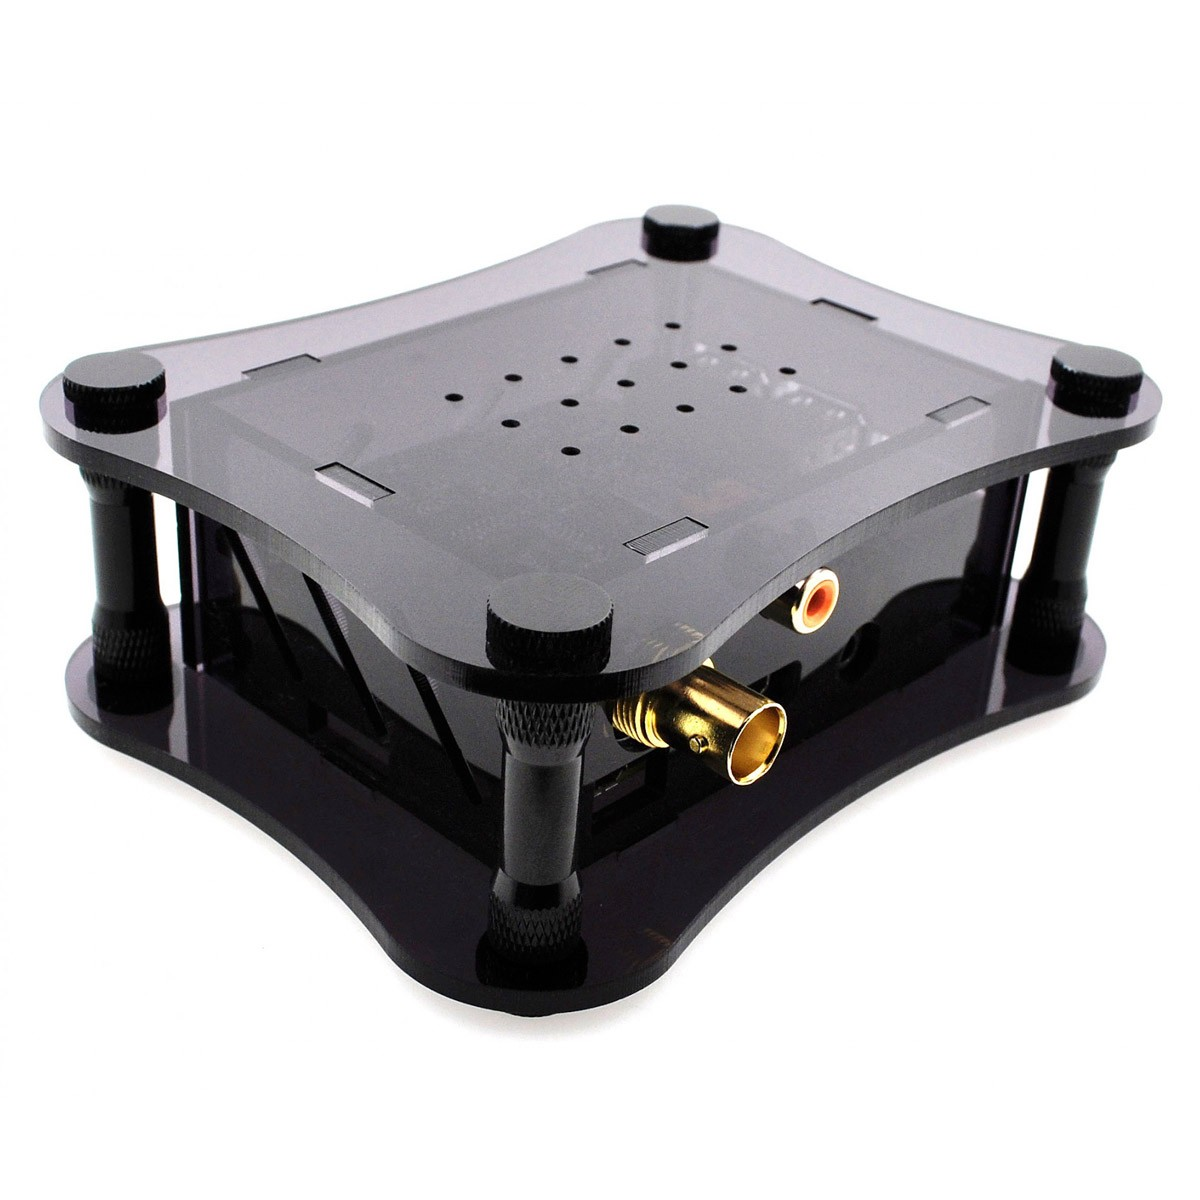 ALLO DIGIONE PLAYER Streamer Raspberry Pi 4 Digital Interface DigiOne Volumio Pre-Installed Black